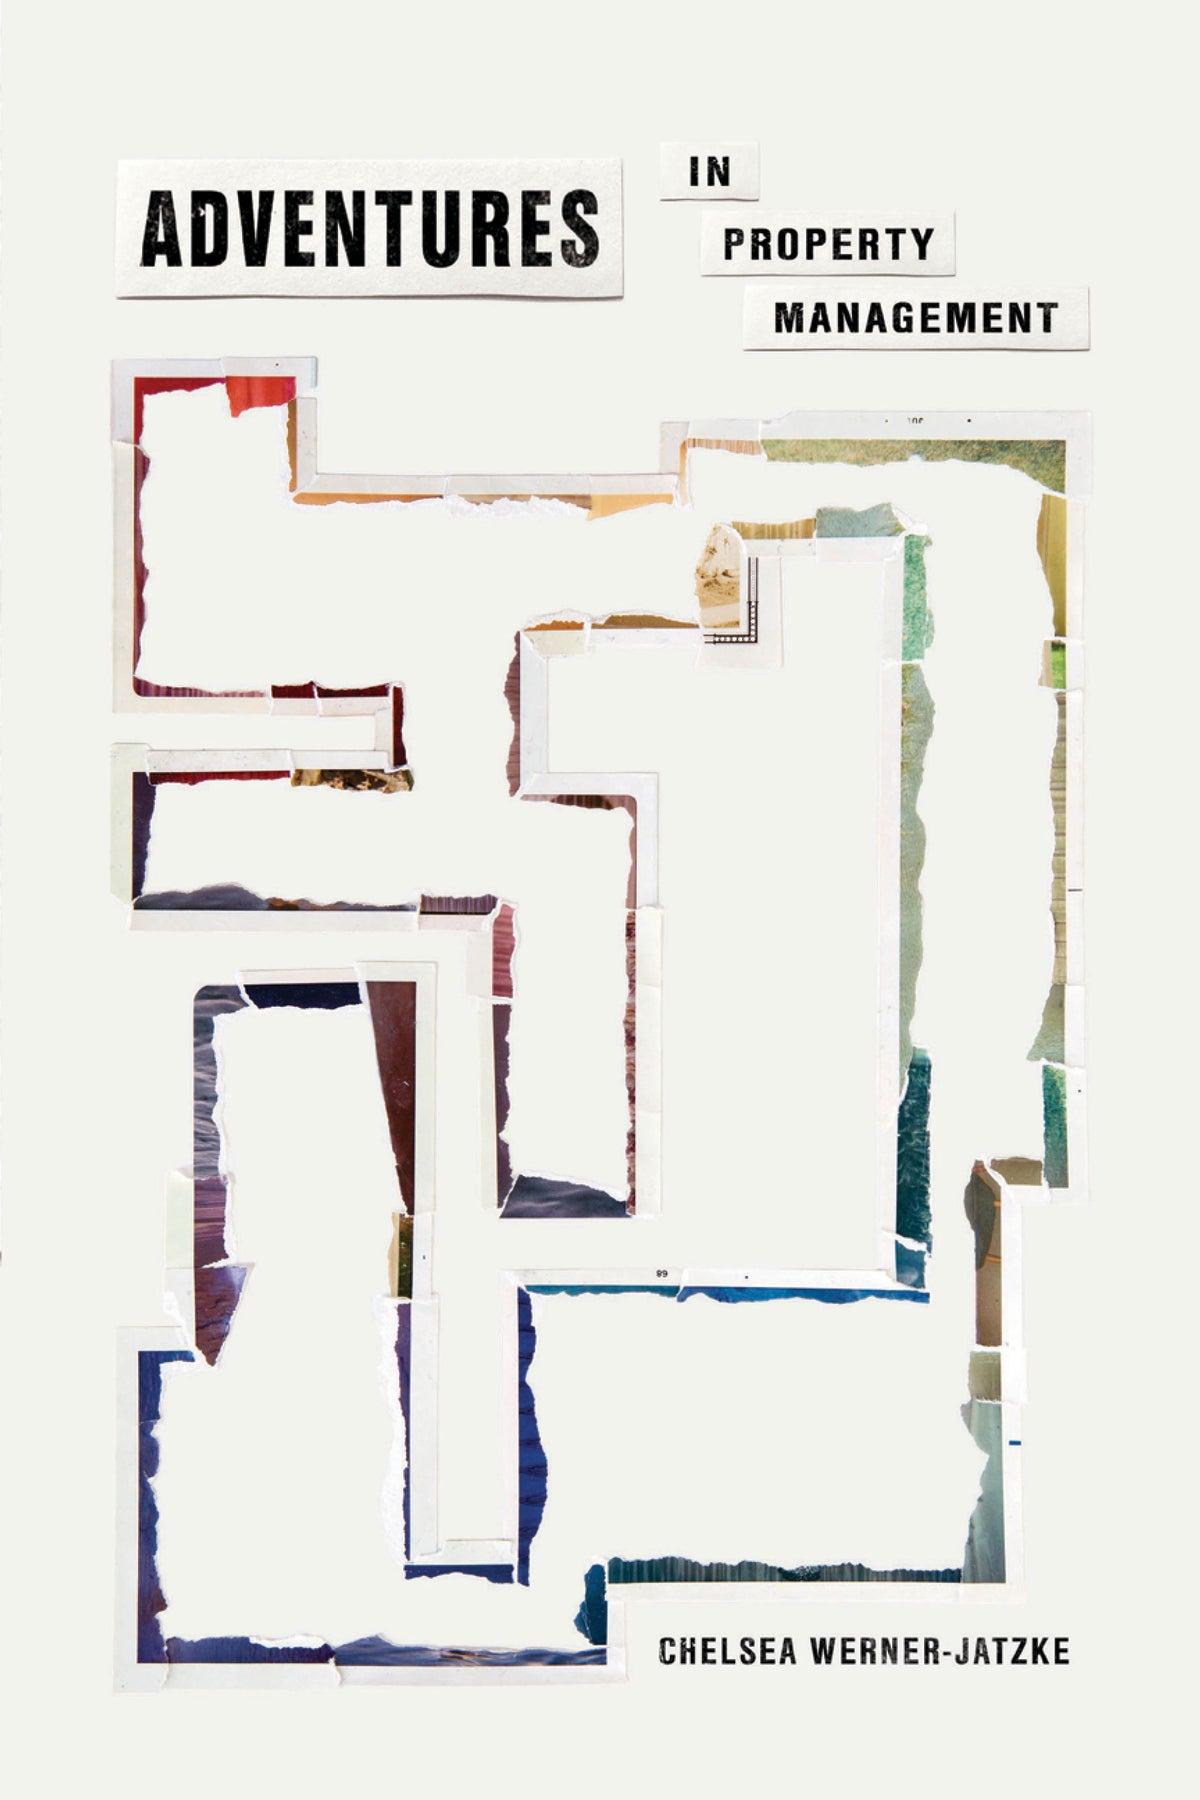 Image of Adventures in Property Management by Chelsea Werner-Jatzke